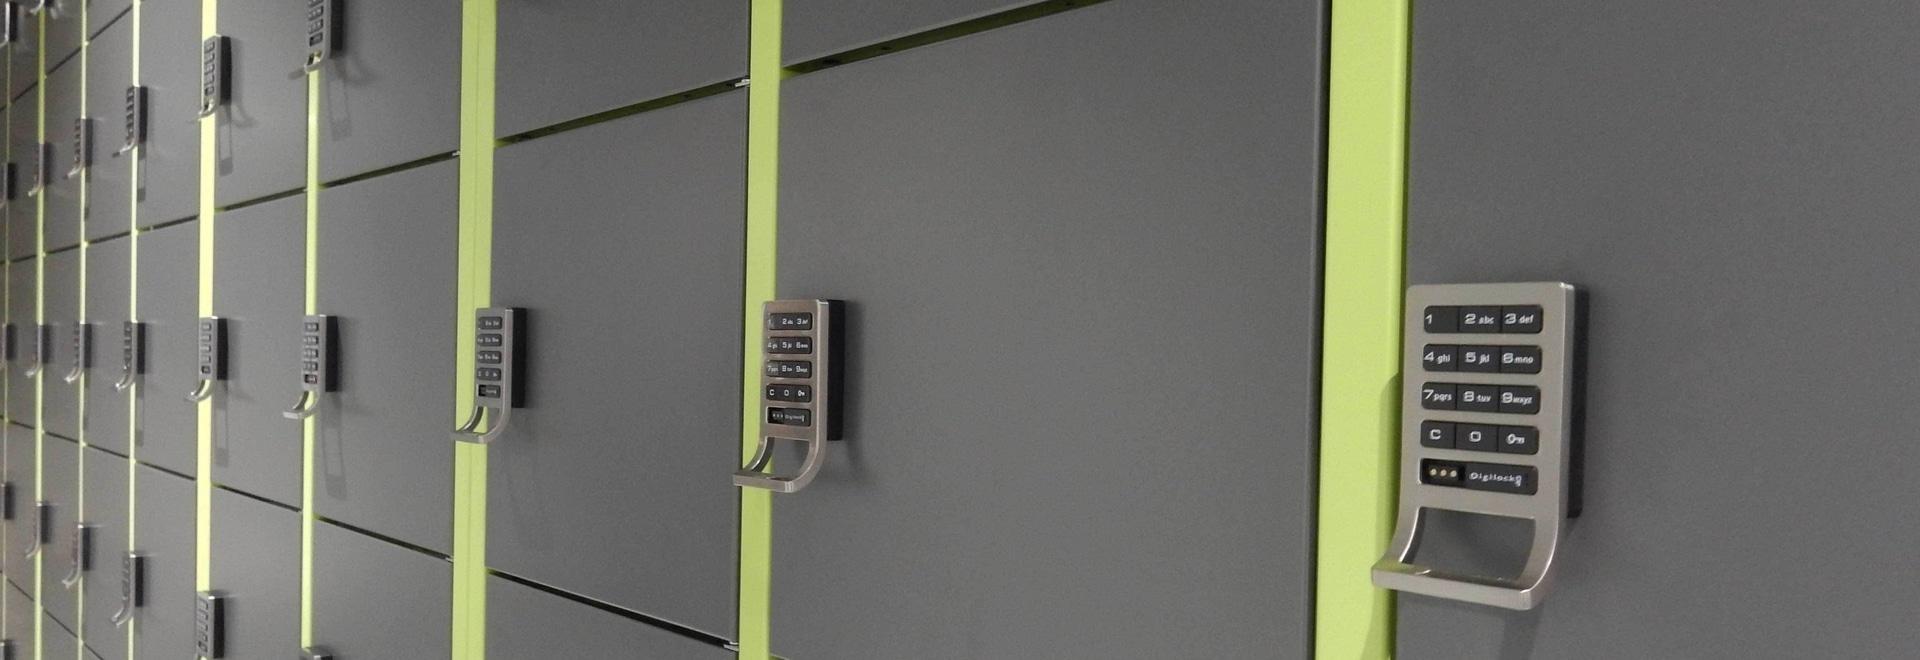 Digilock's electronic keypad locks